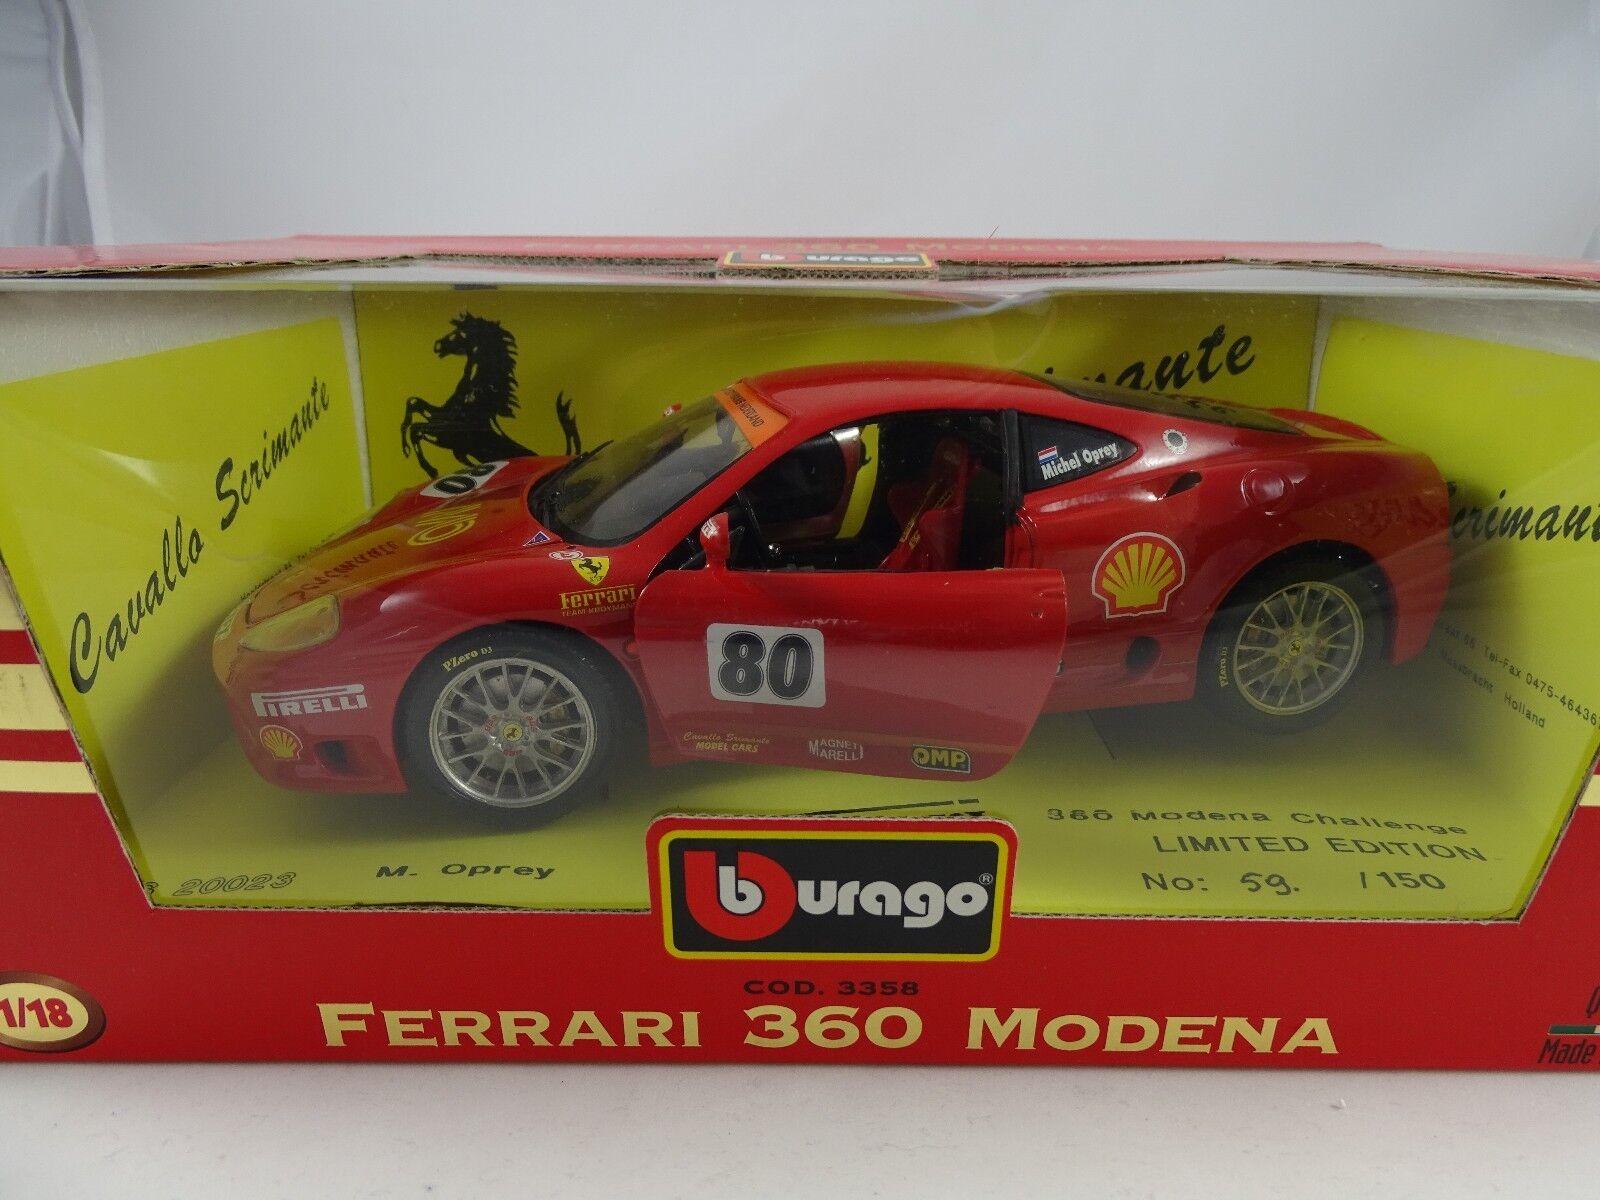 1 18 Bburago  3358 ferrari 360 Modena oprey rojo limitado a solo 150 St. mundo §